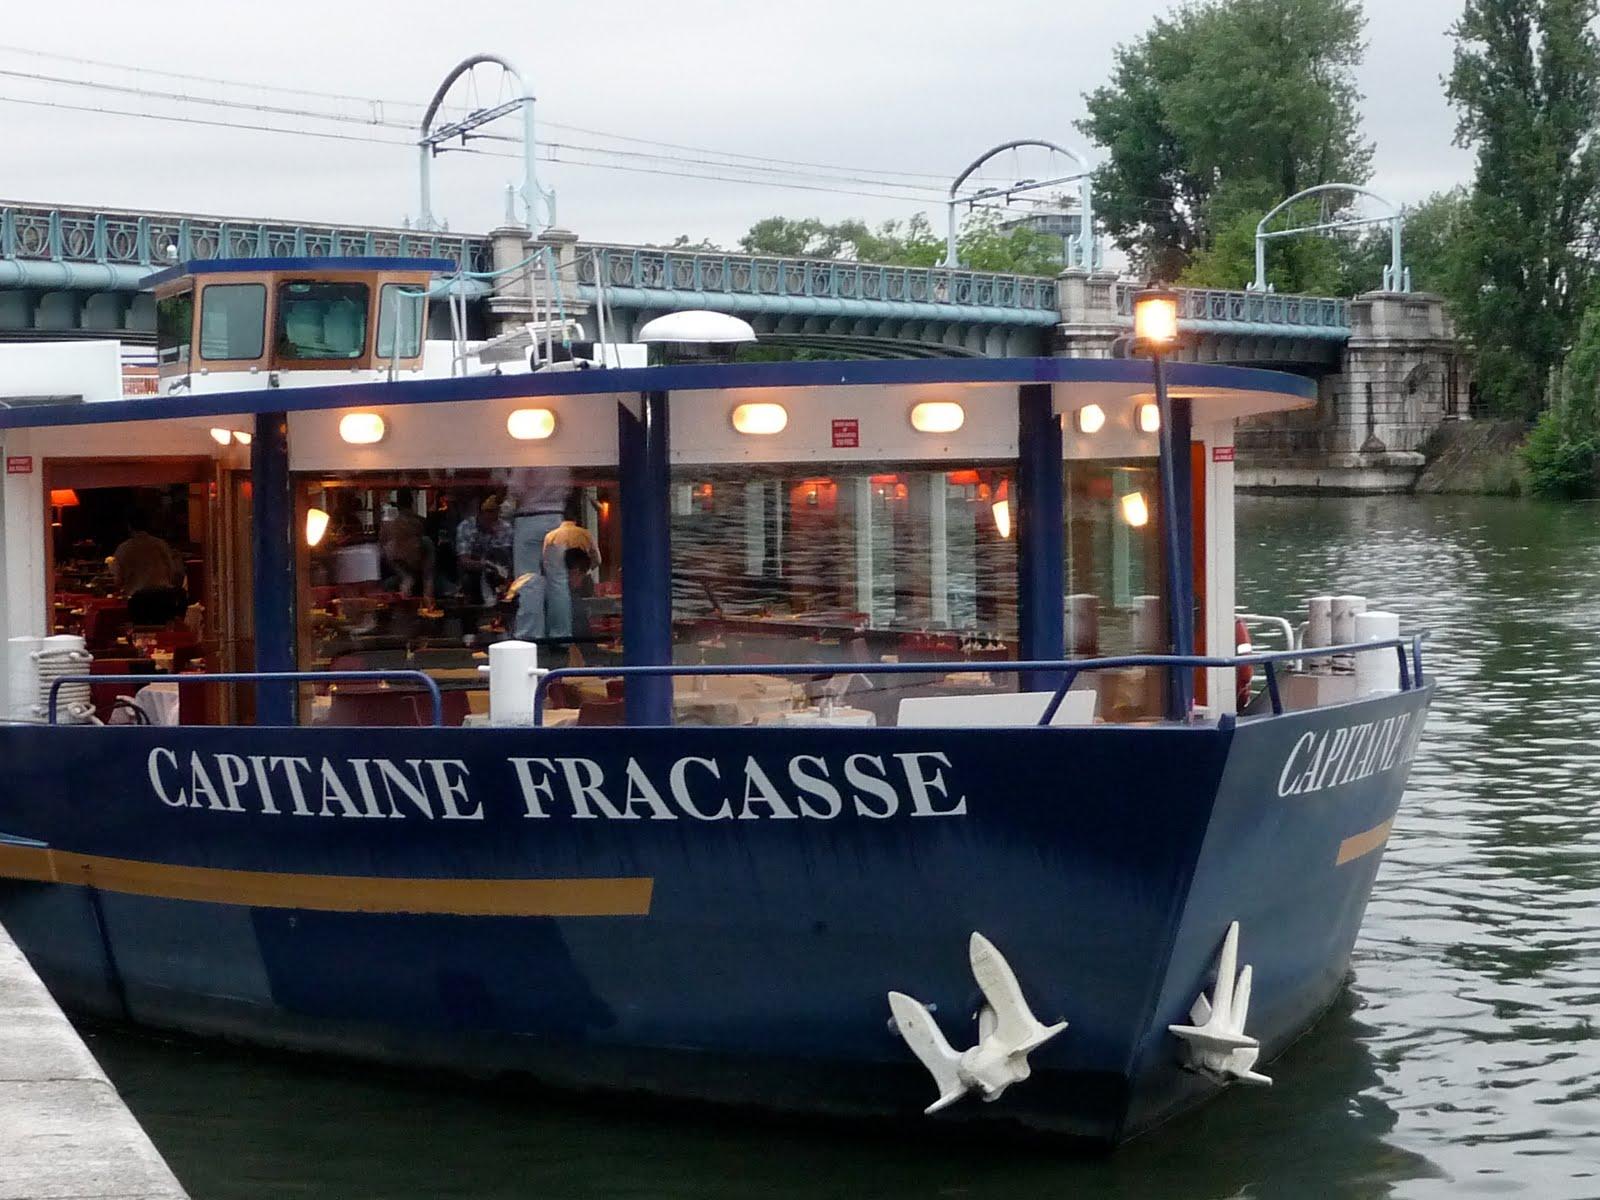 bateau le capitaine fracasse